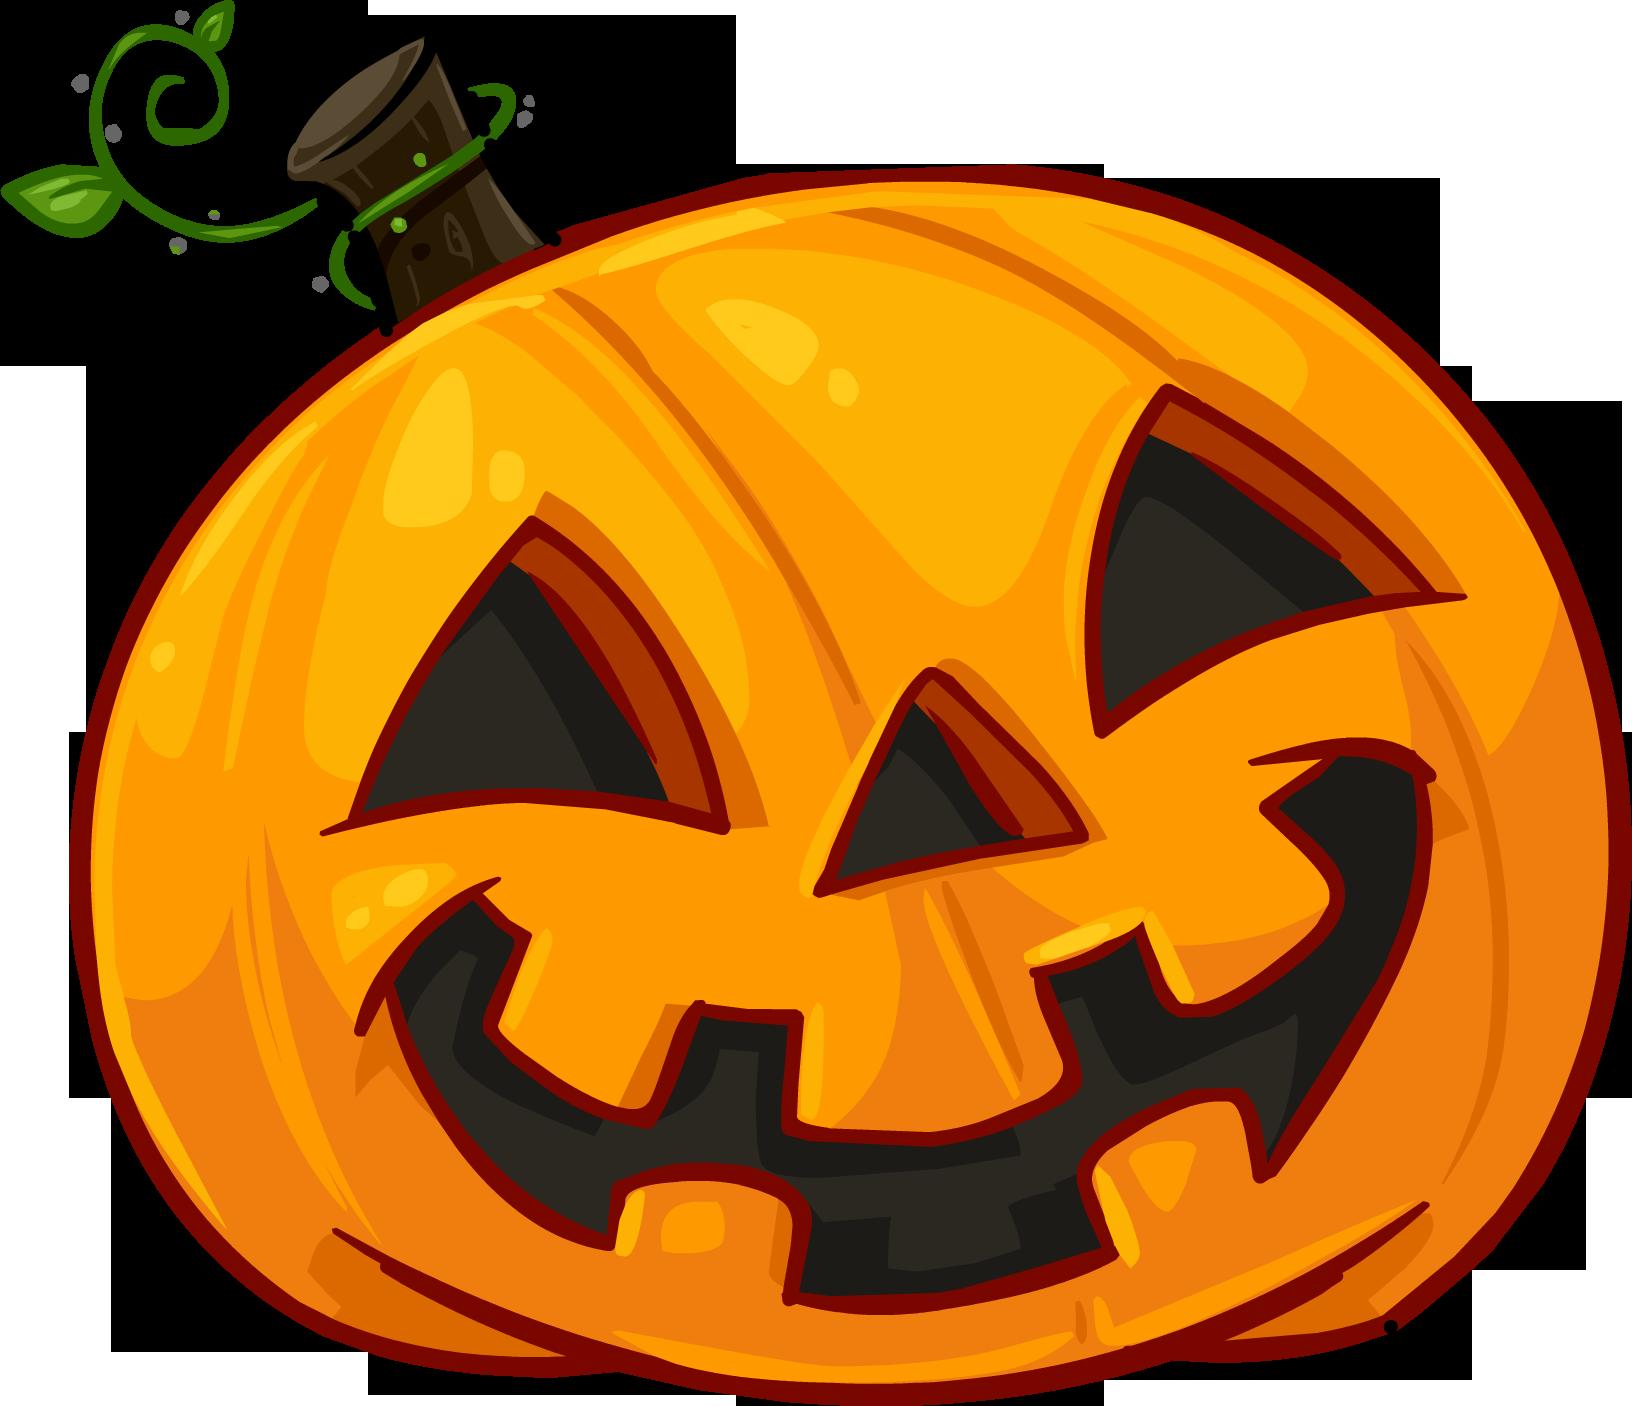 Clipart pumpkin pumpkin decorating. All events for paint